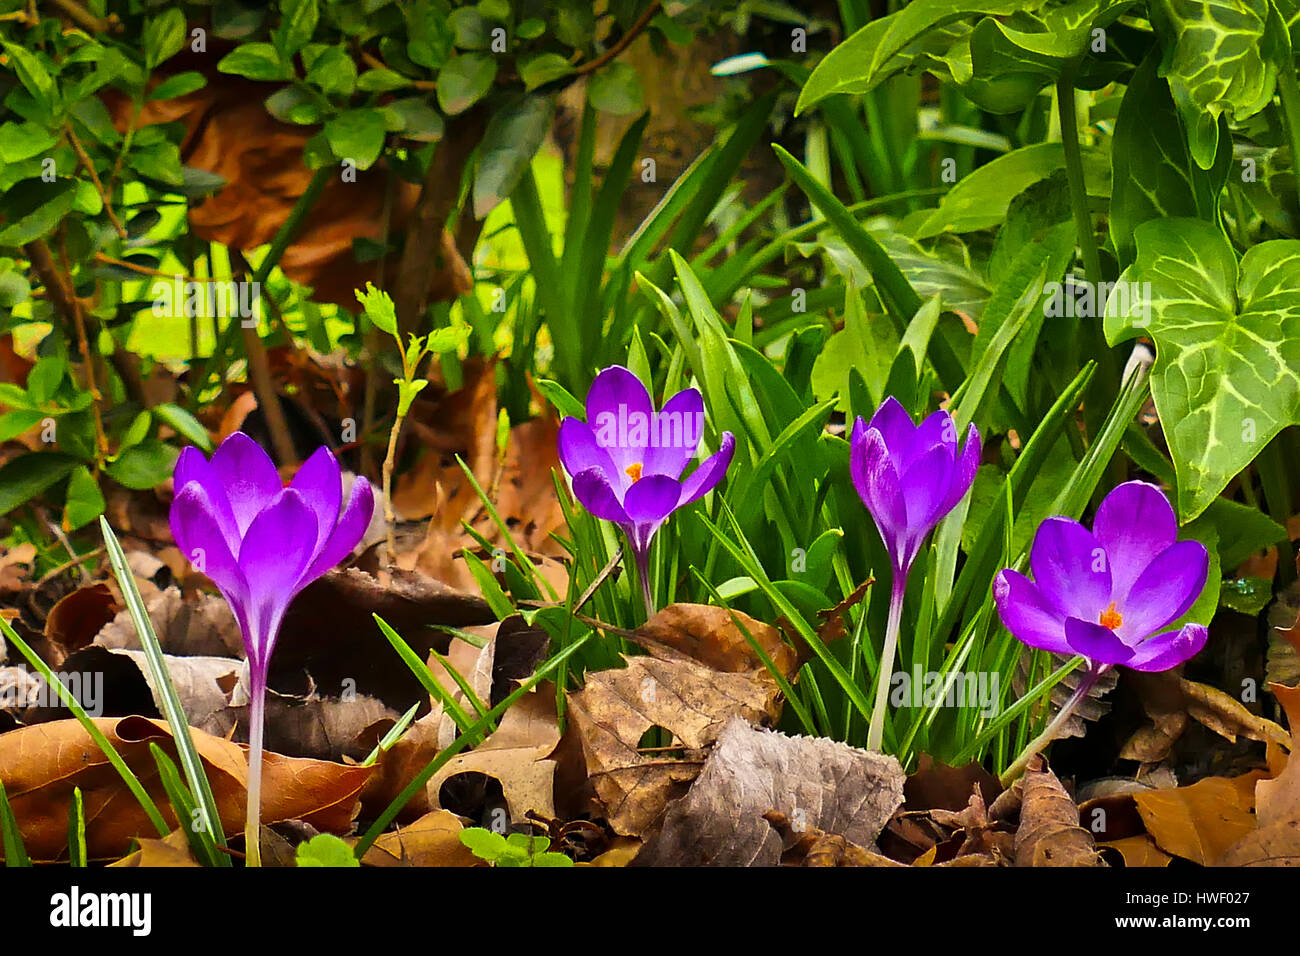 Mauve crocuses in bloom growing in a London garden Stock Photo